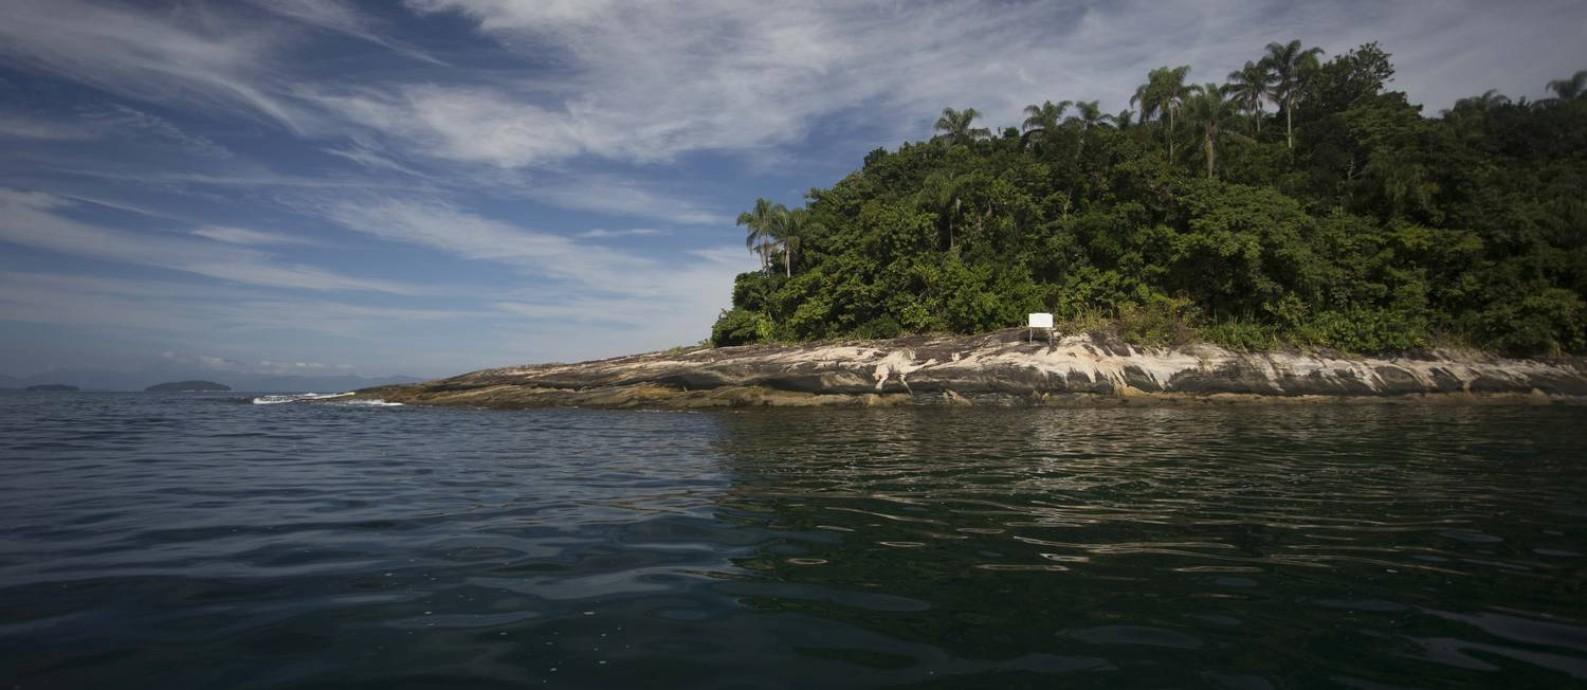 Na foto, a Ilha da Samambaia, local onde o presidente Jair Bolsonaro foi multado por pesca ilegal Foto: Márcia Foletto / Agência O Globo